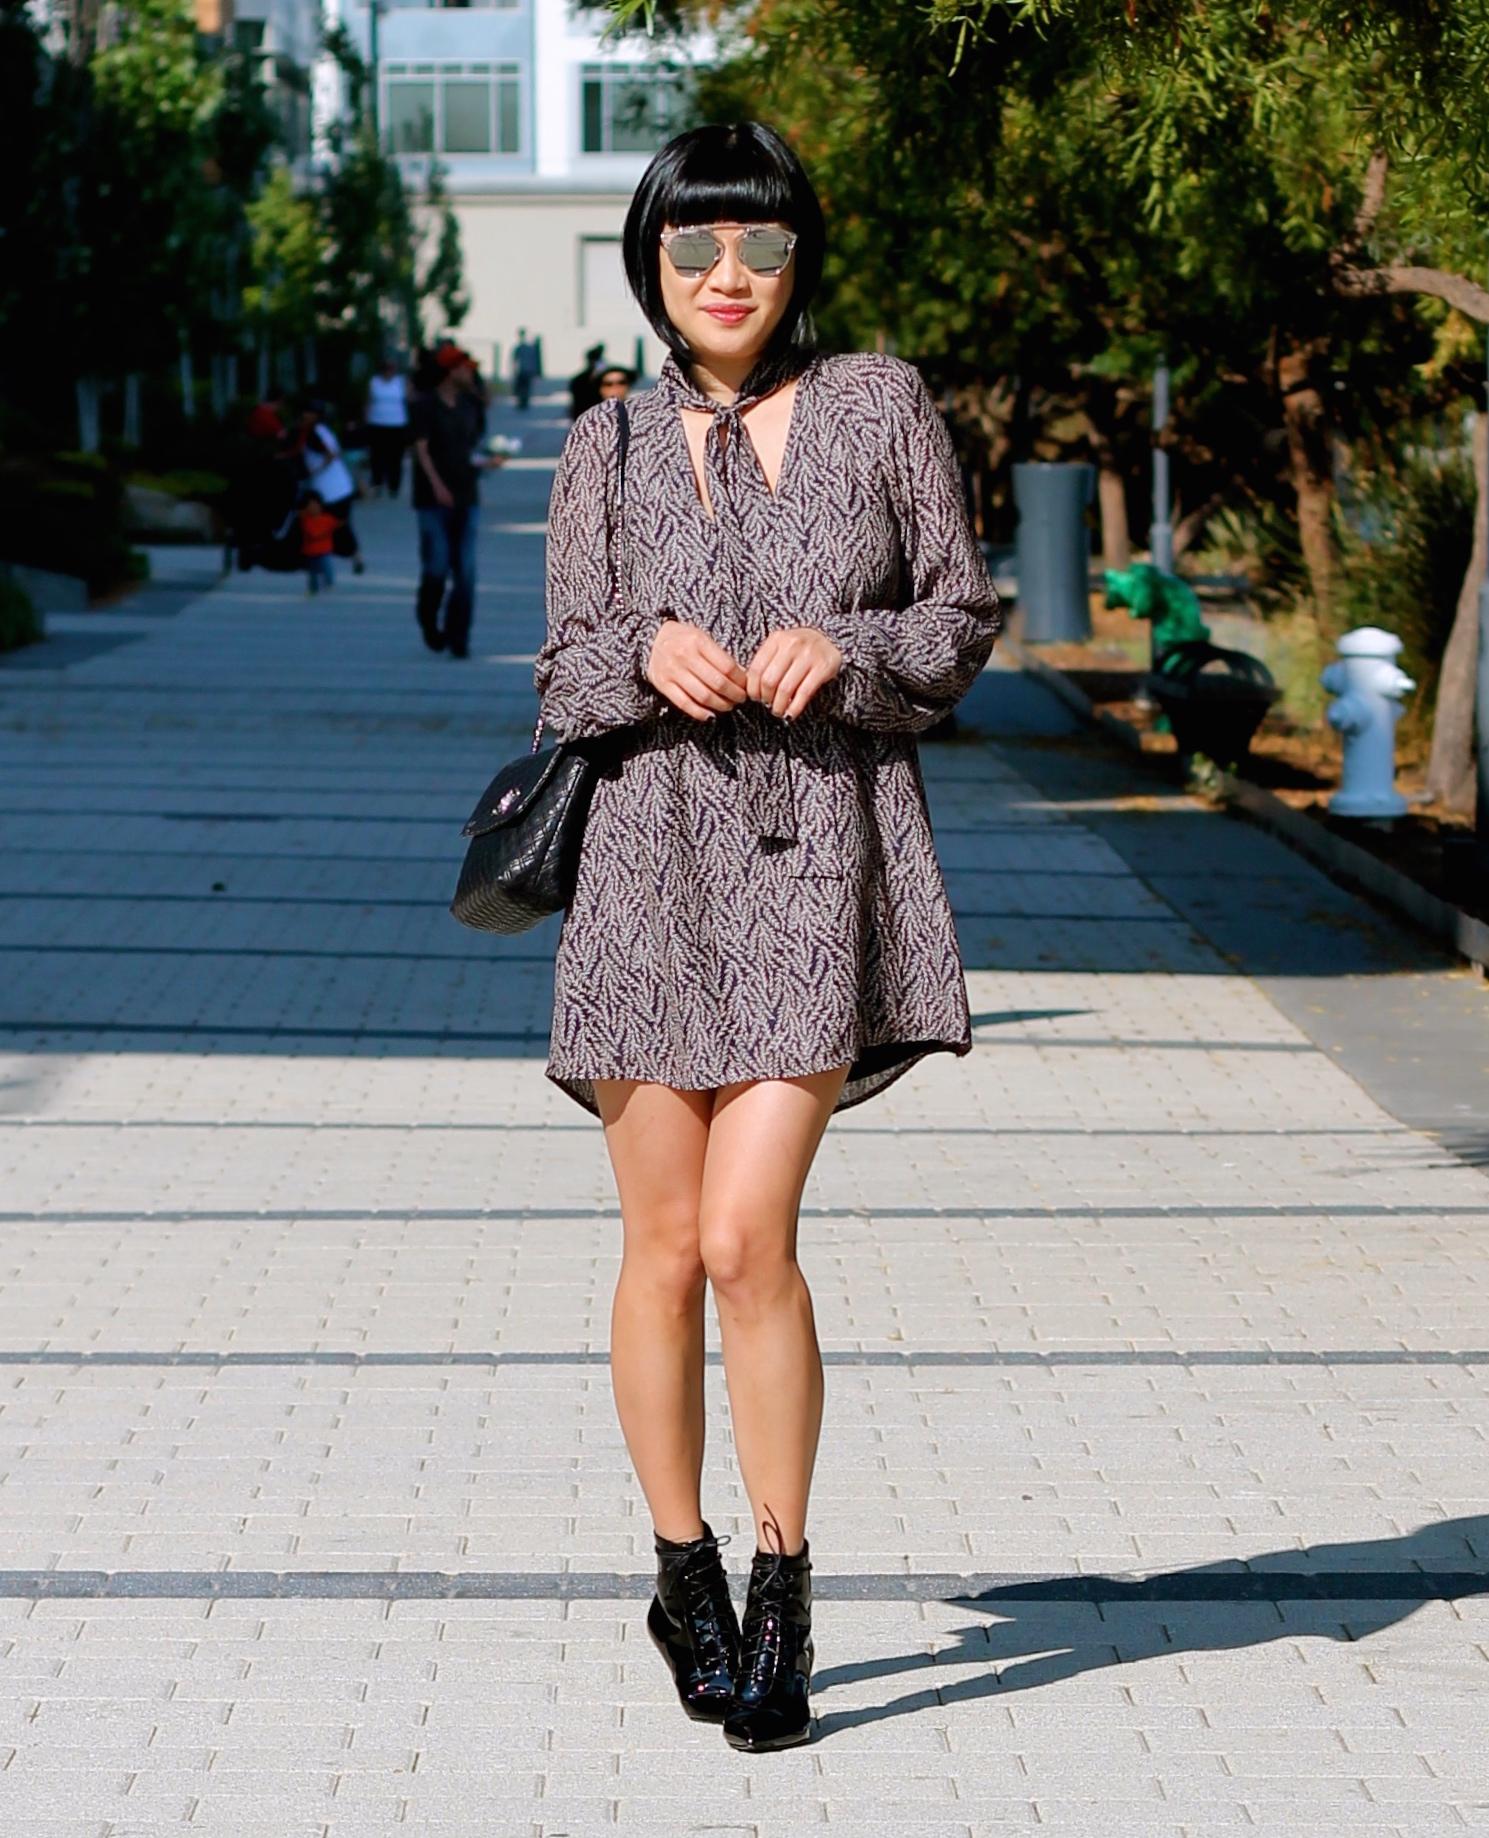 Aritzia dress, Saint Laurent boots, Marc Jacobs bag, Dior sunglasses